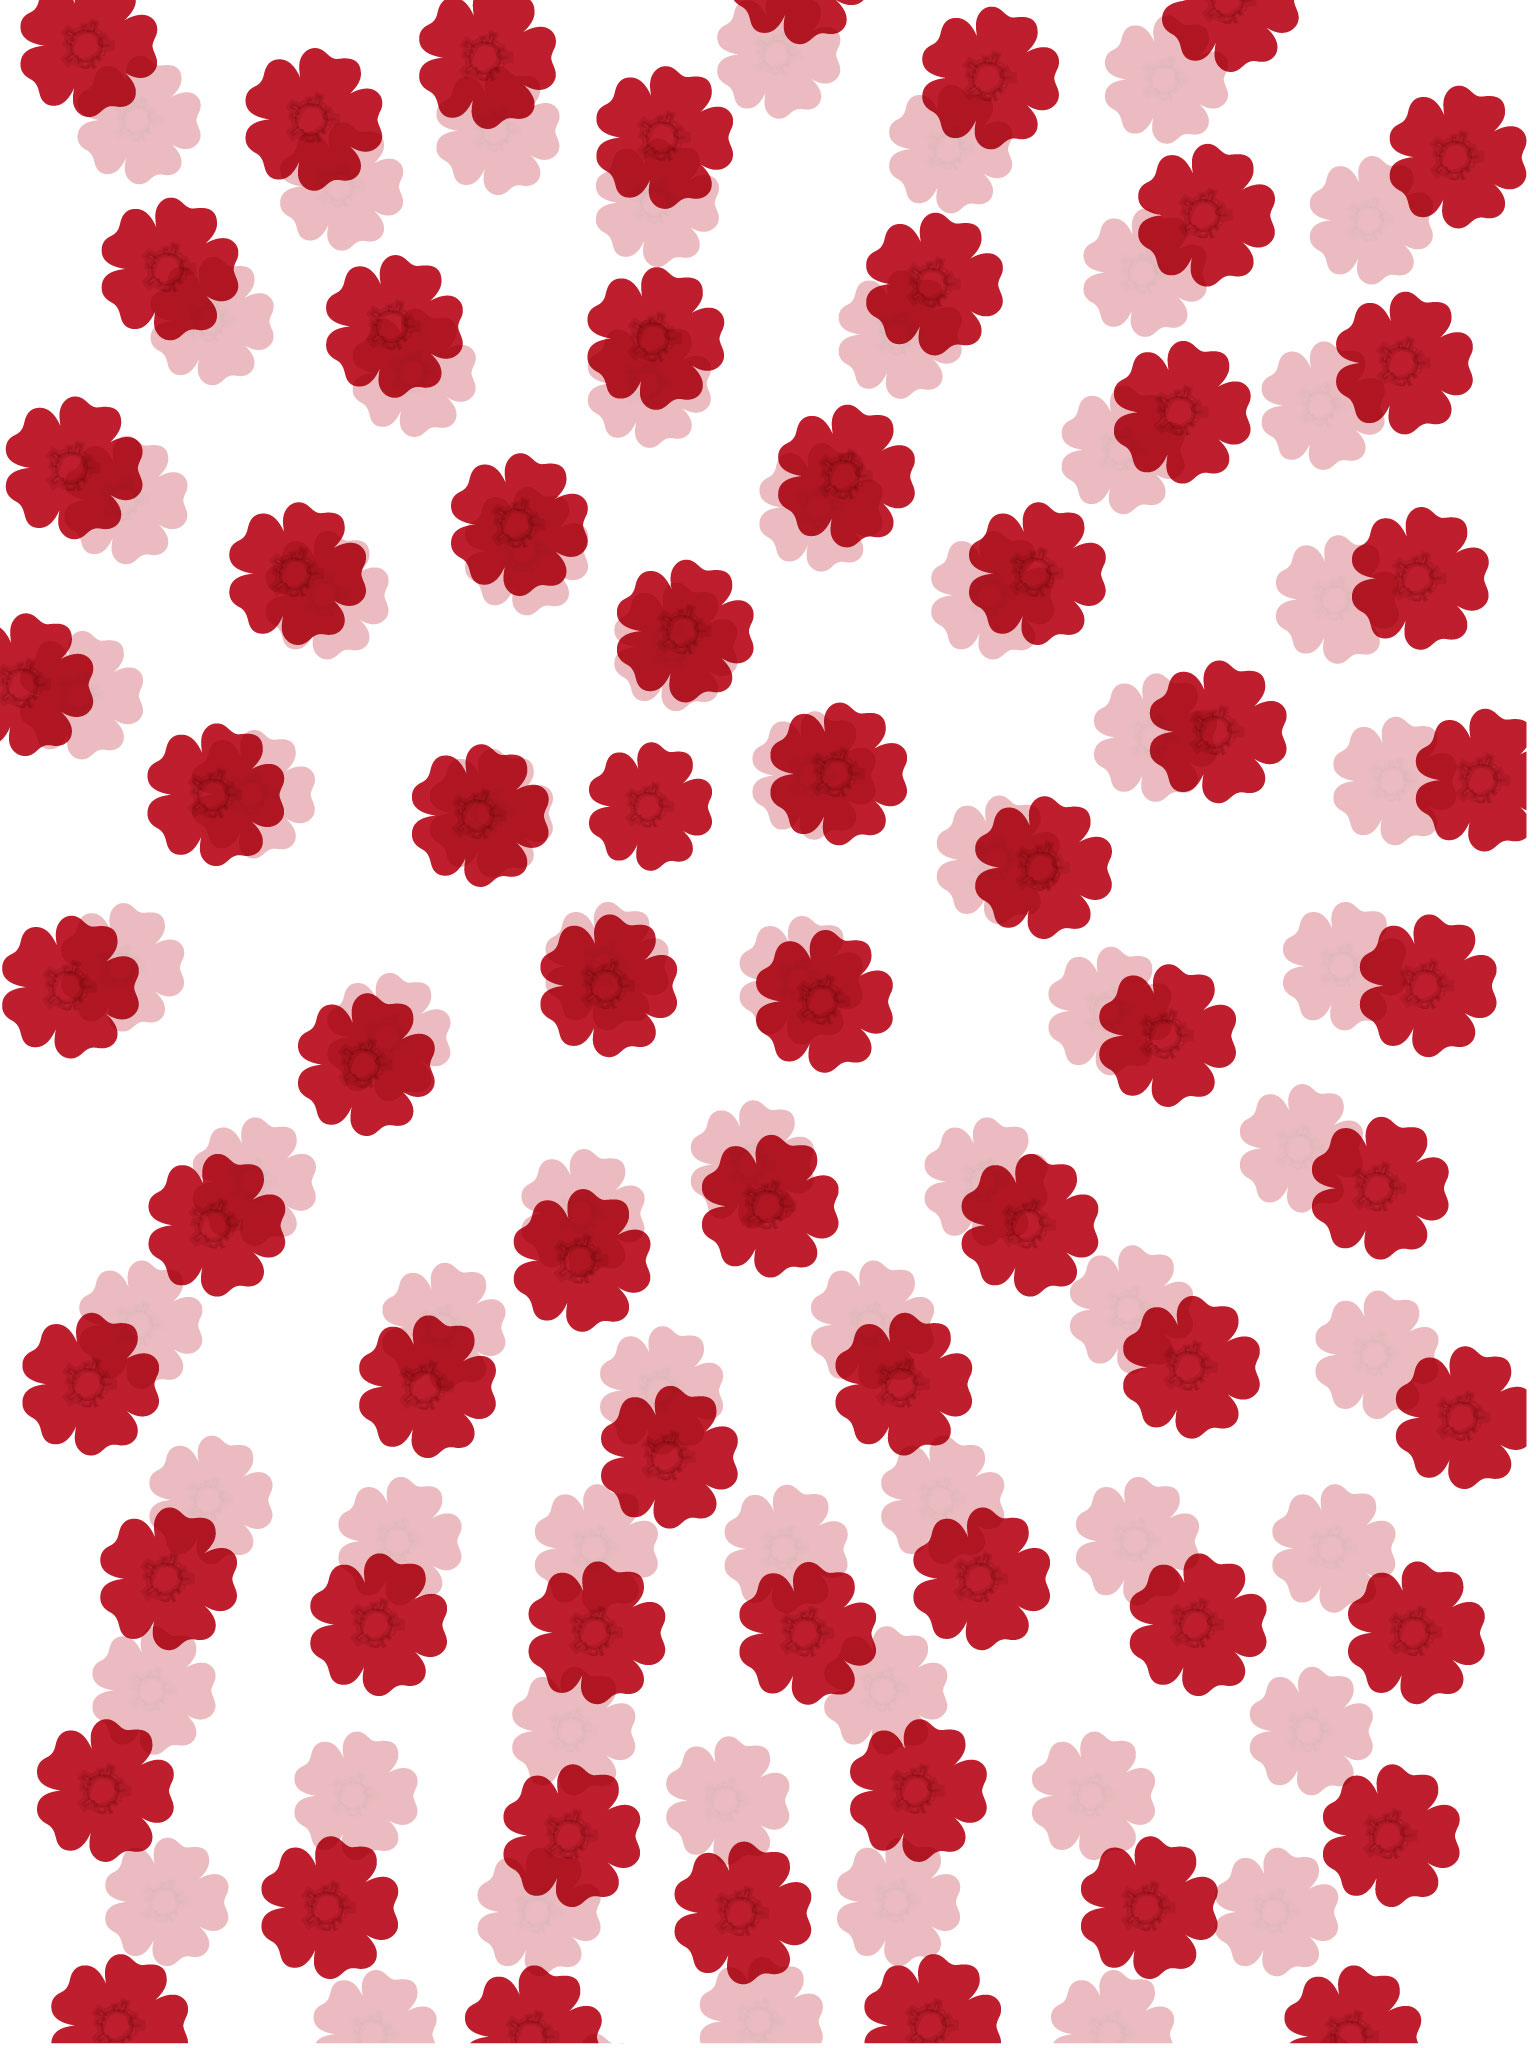 Floral Ipad Valentine Sdaywallpaper Babe Daily